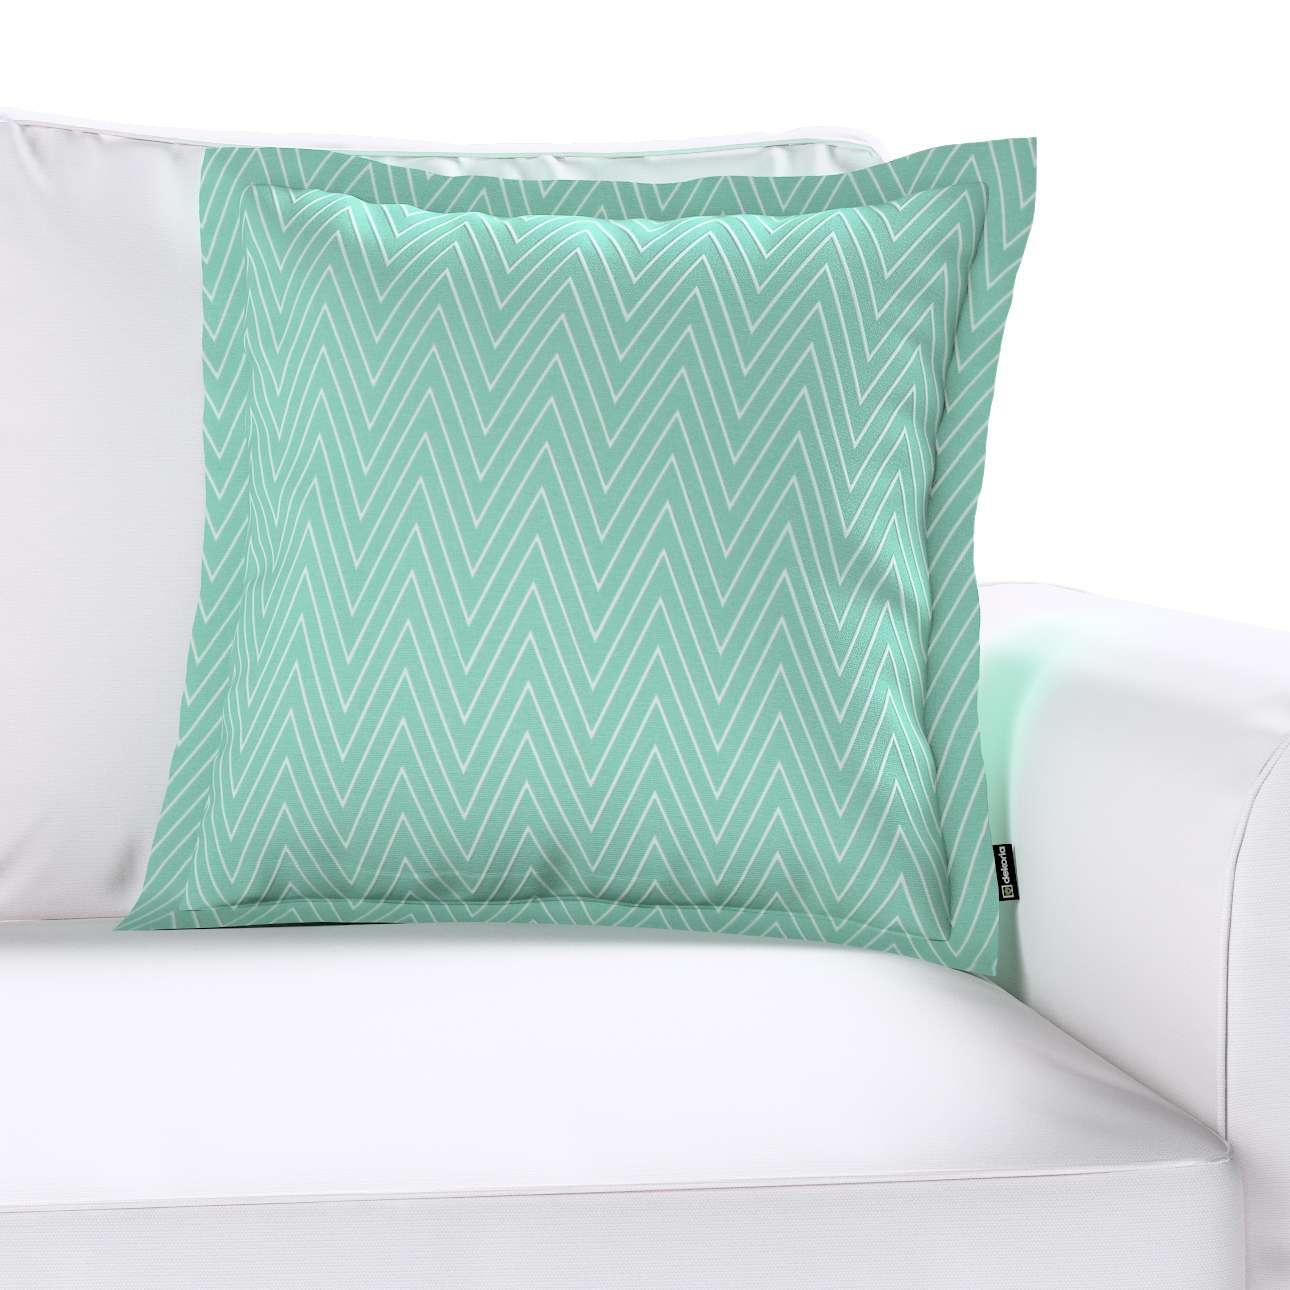 Poszewka Mona na poduszkę w kolekcji Brooklyn, tkanina: 137-90